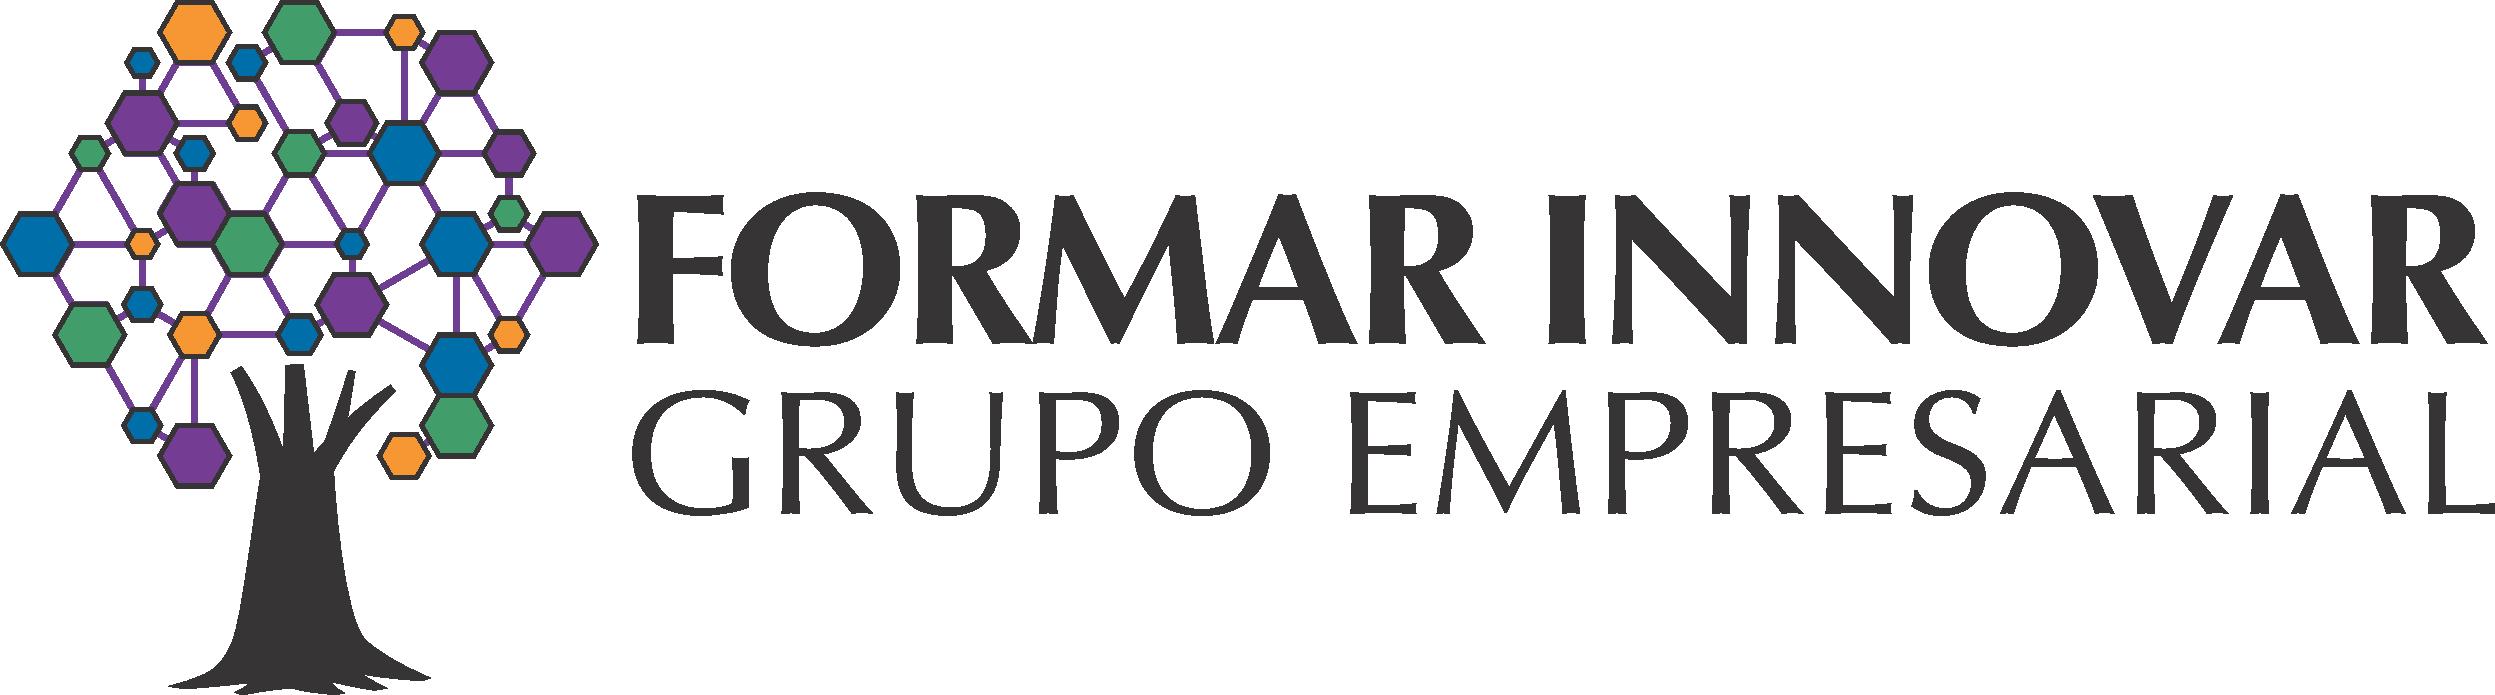 Grupo Empresarial Formar Innovar